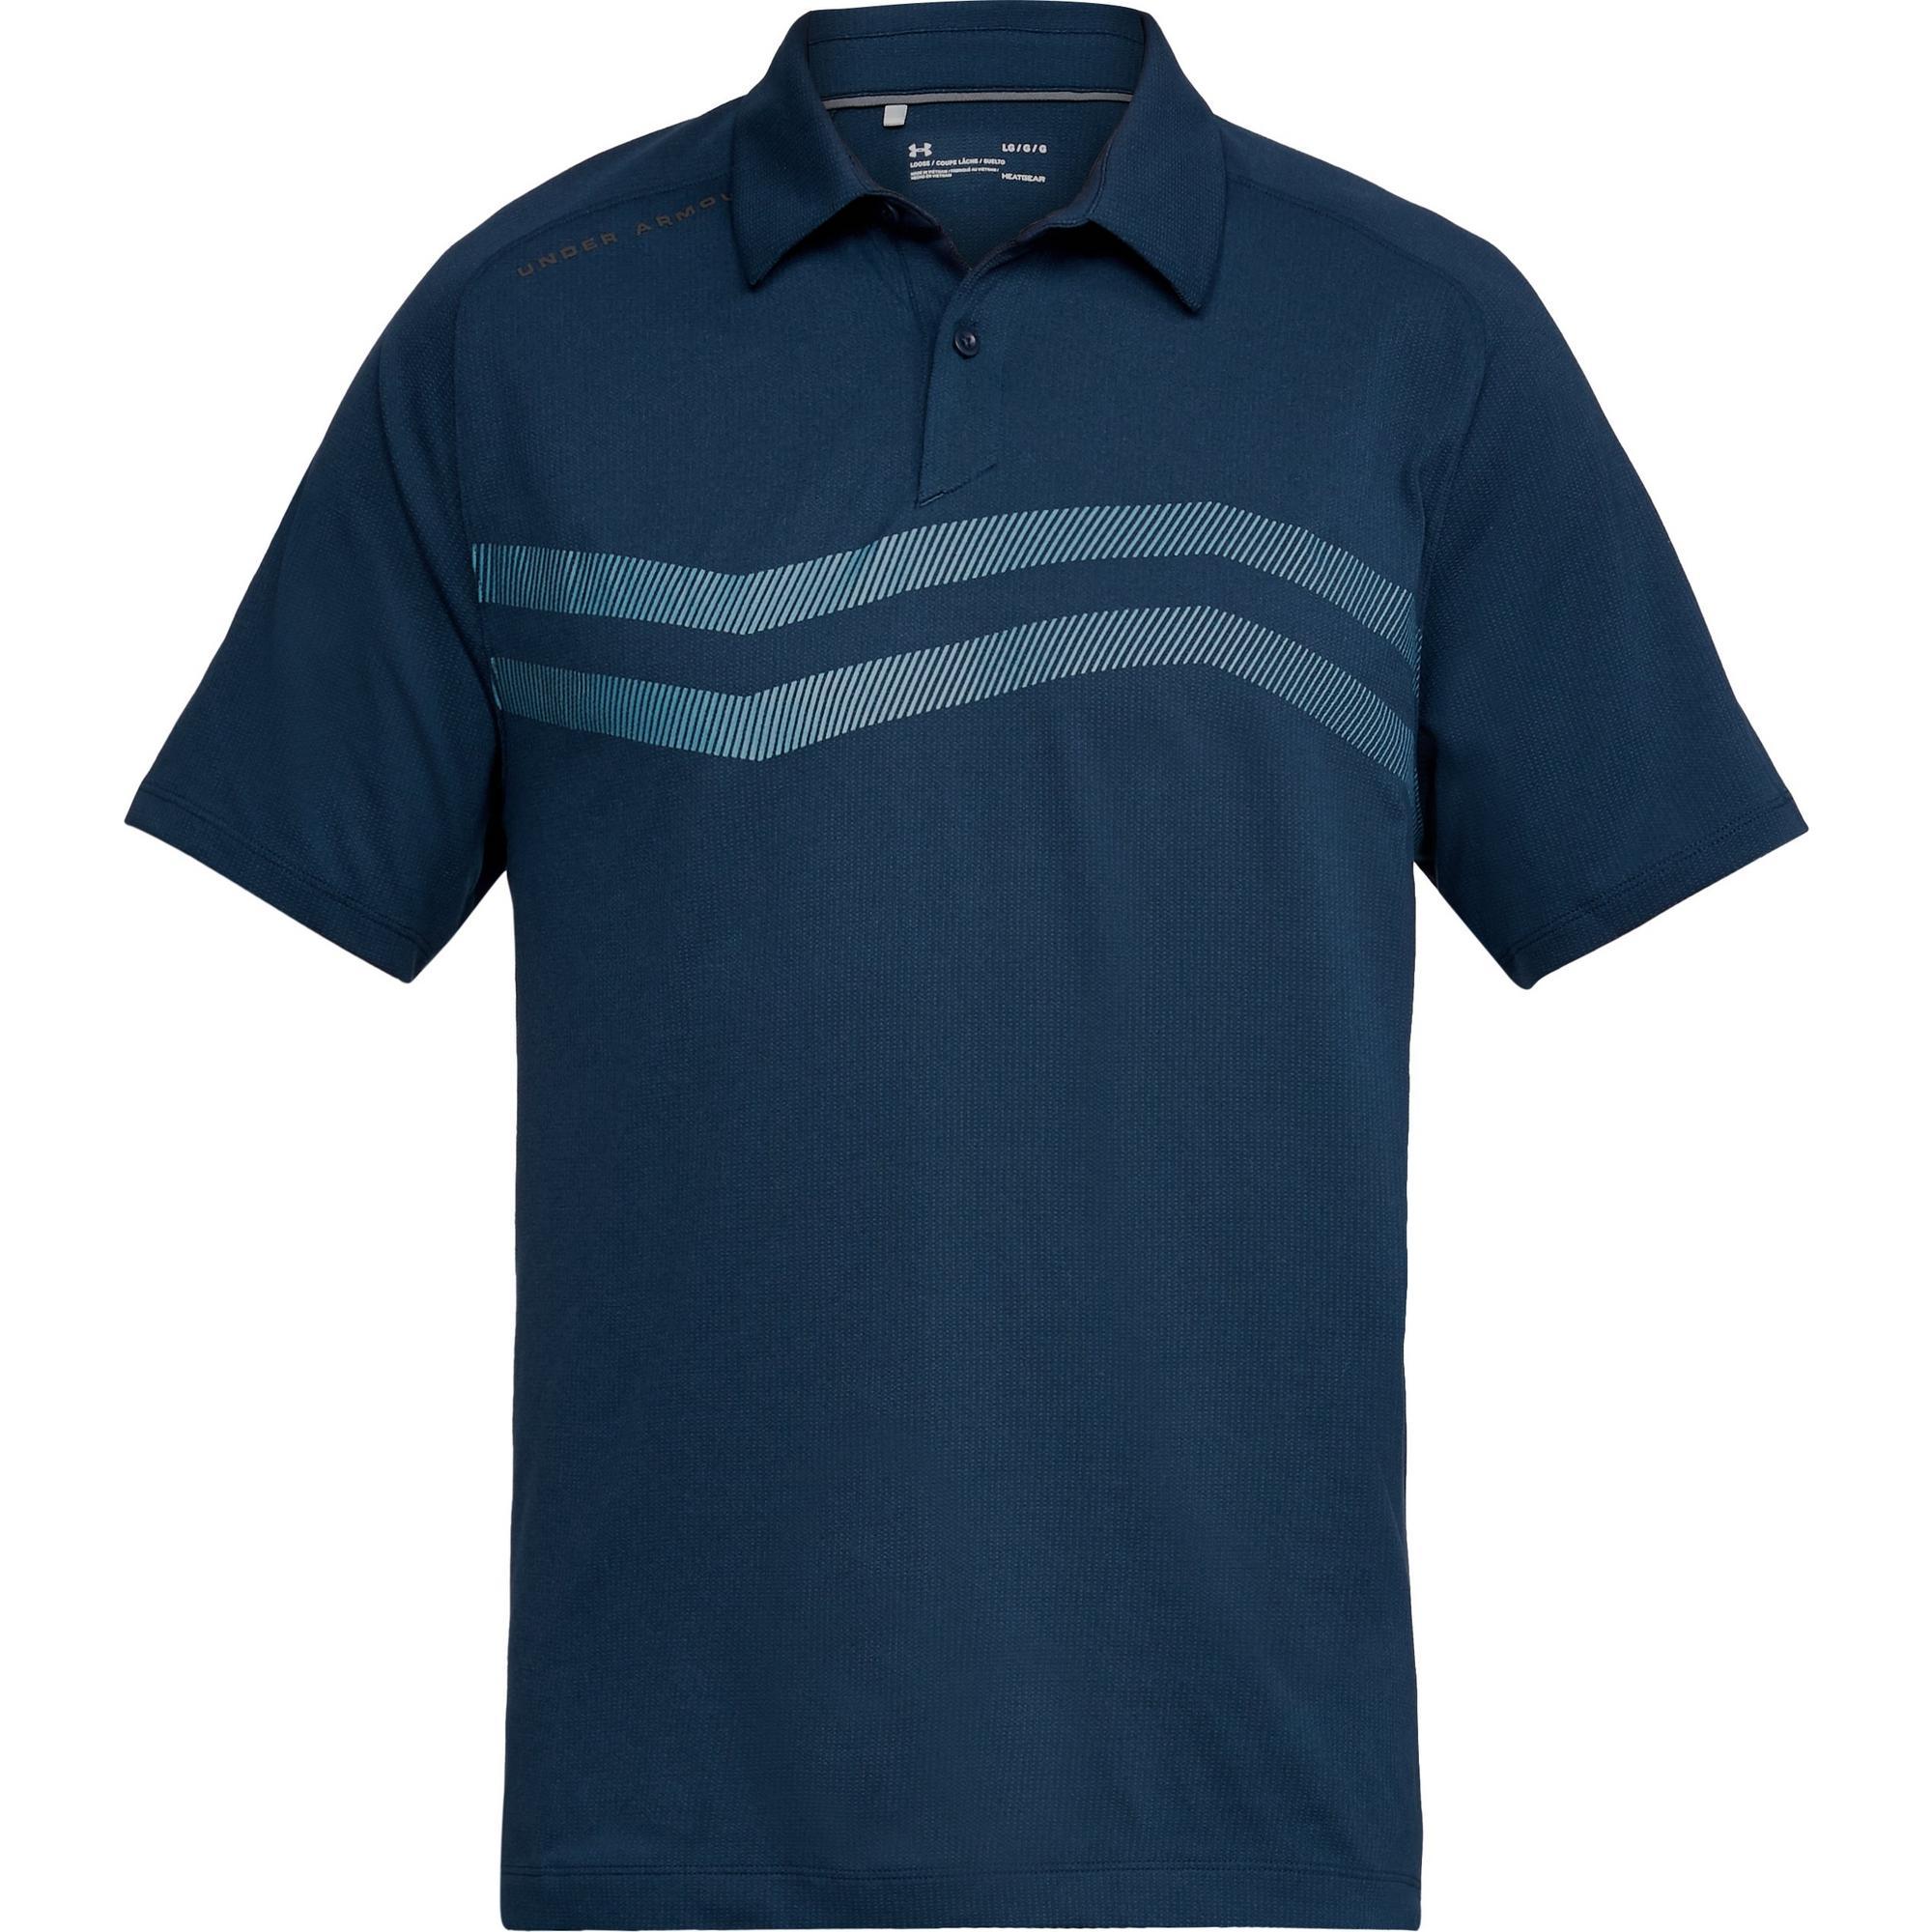 Men's Threadborne Short Sleeve Polo